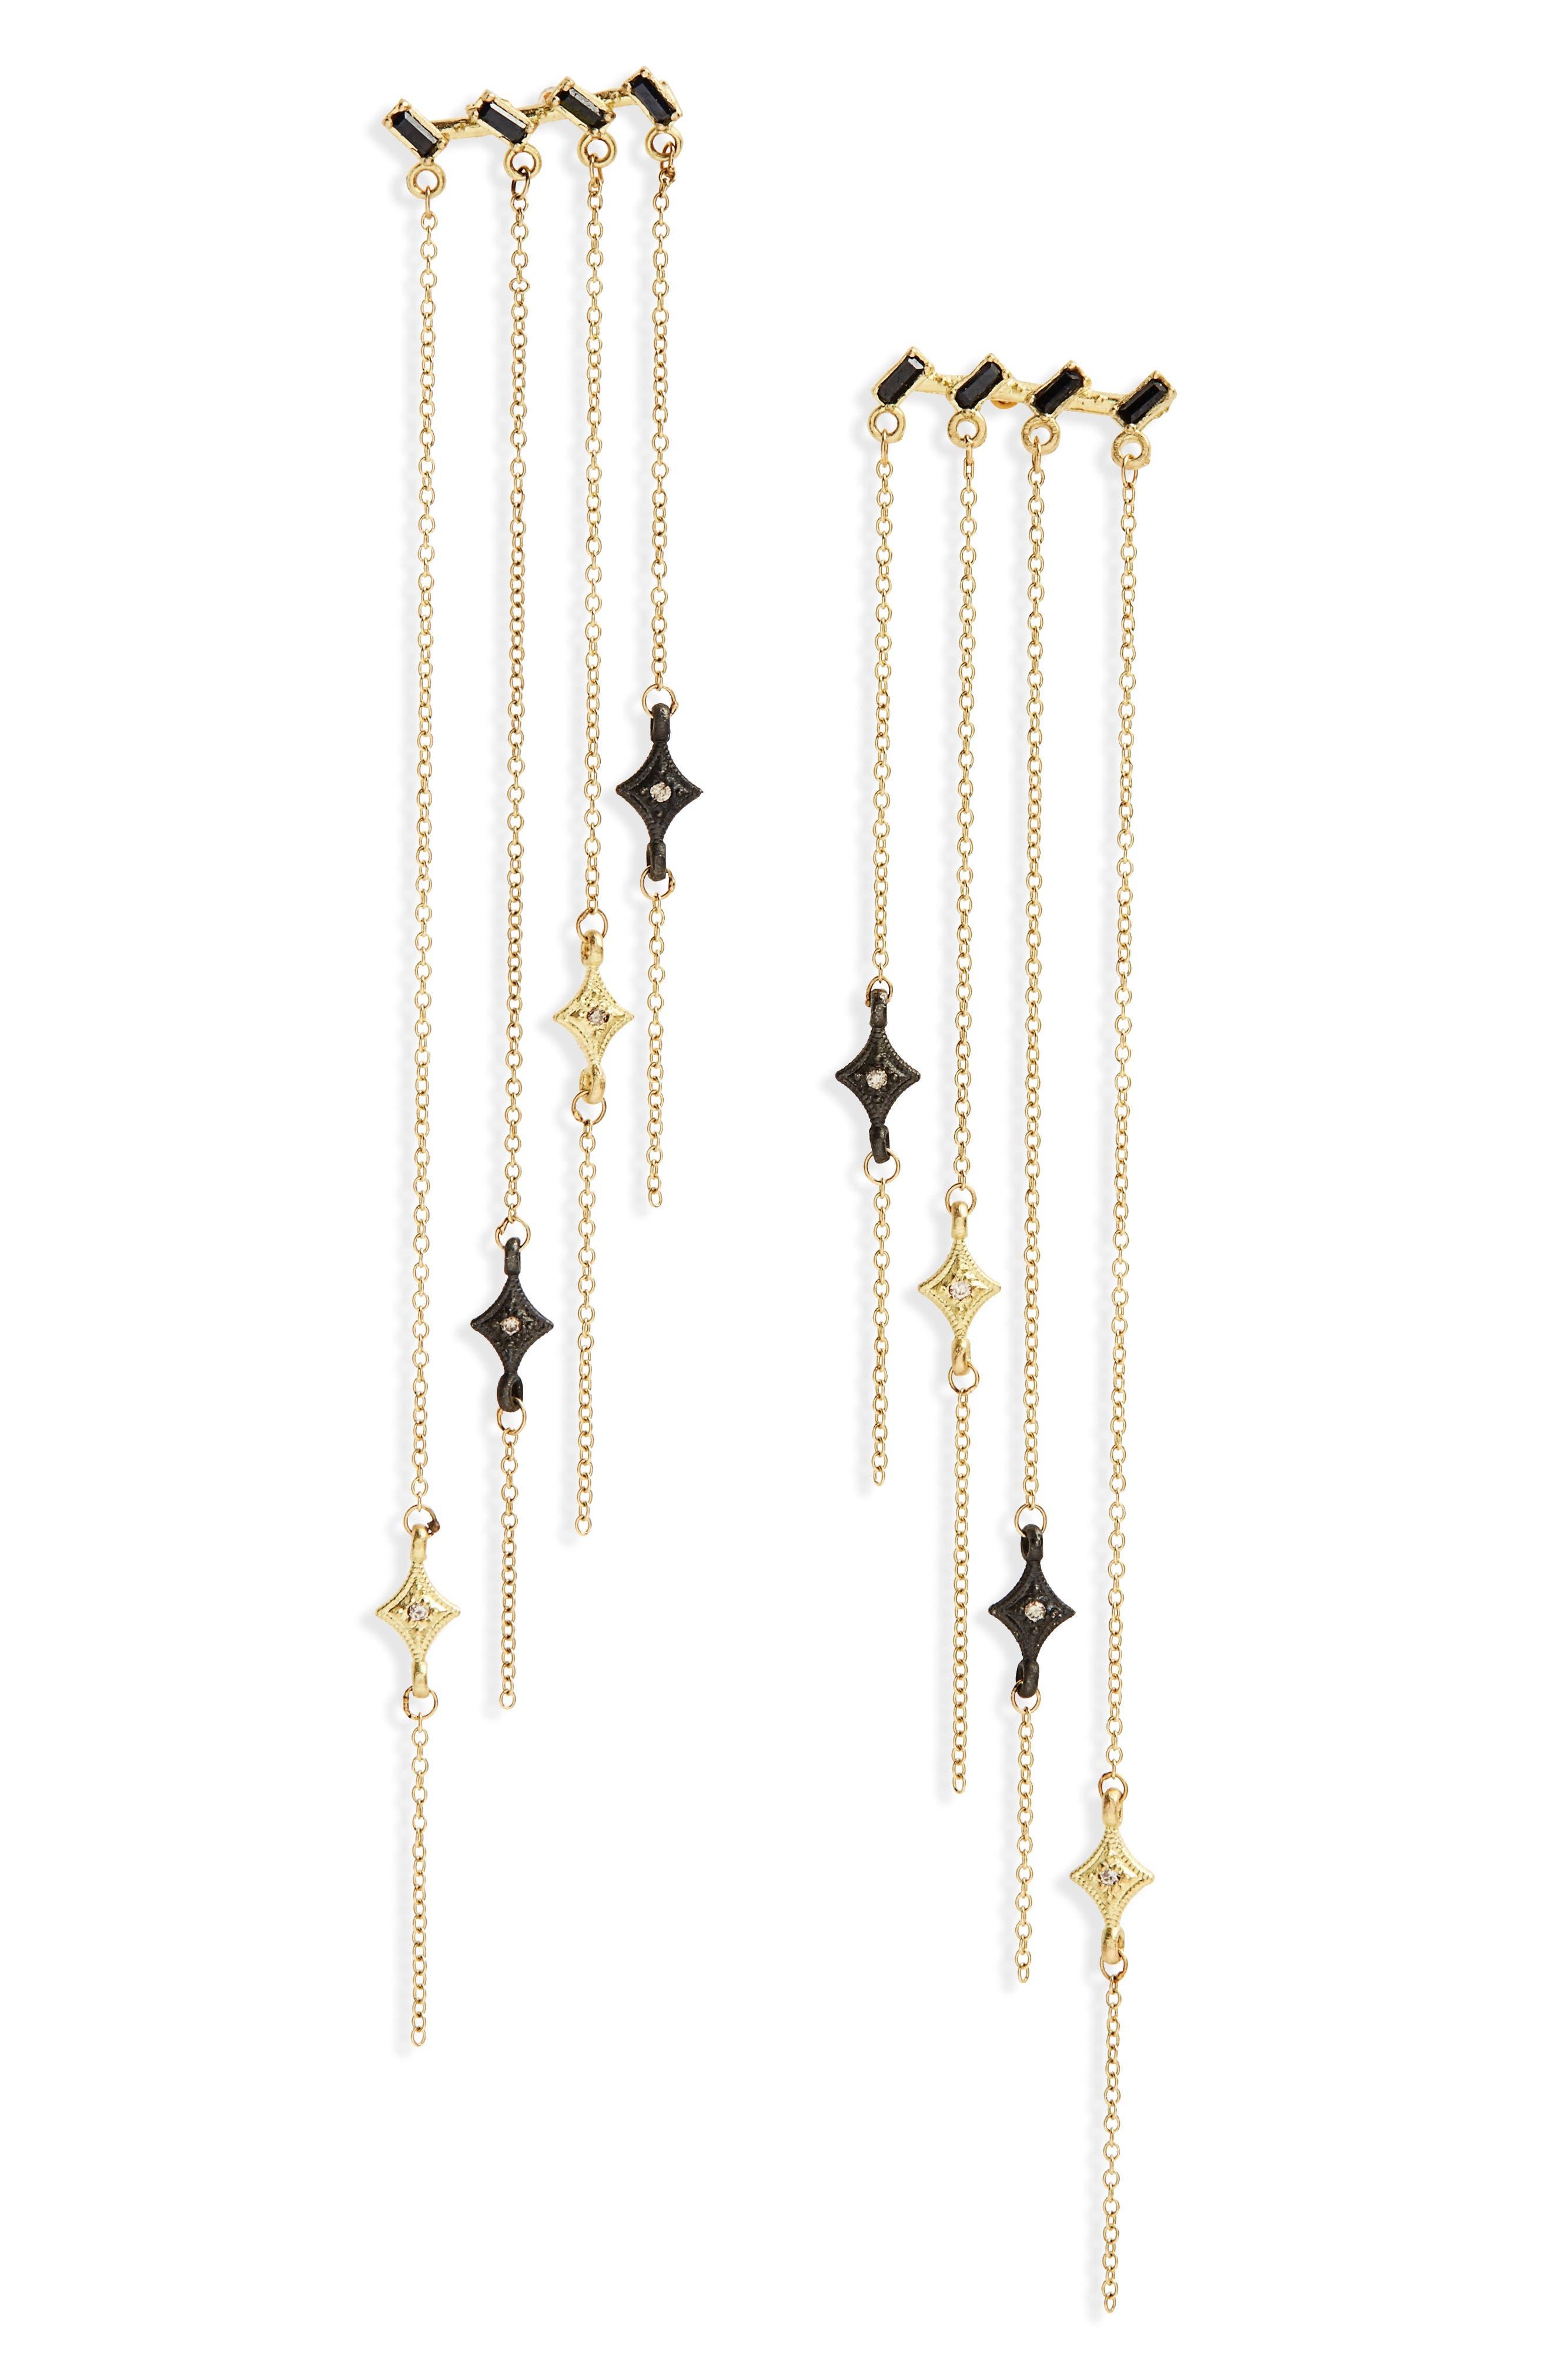 Old World Sapphire & Diamond Chandelier Earrings,                             Main thumbnail 1, color,                             GOLD